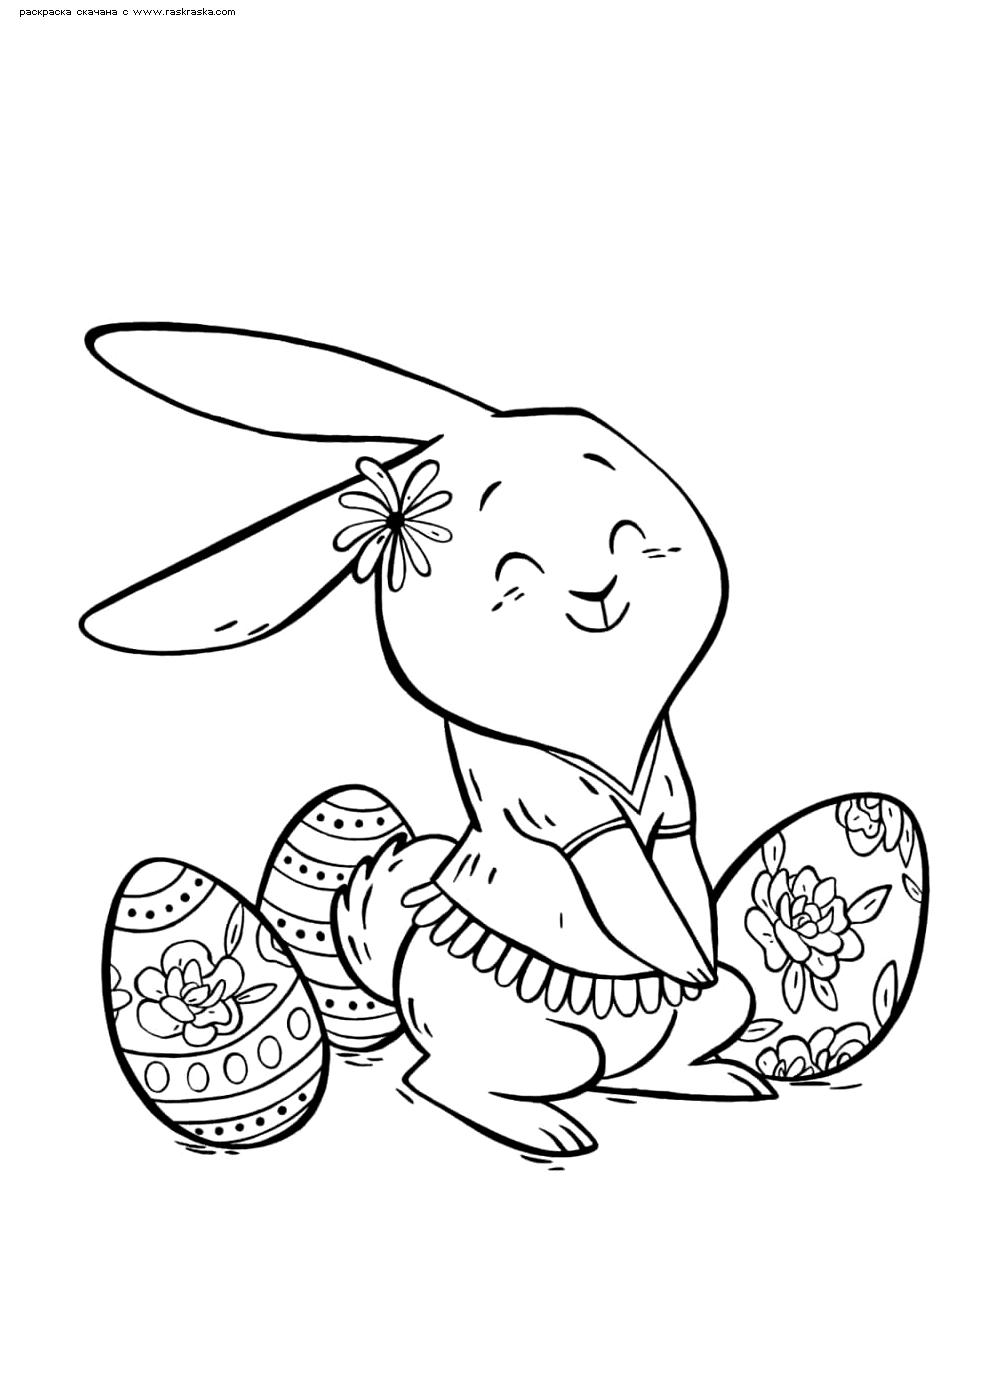 Раскраска Пасхальный кролик. Раскраска Кролик собирает пасхальные яйца